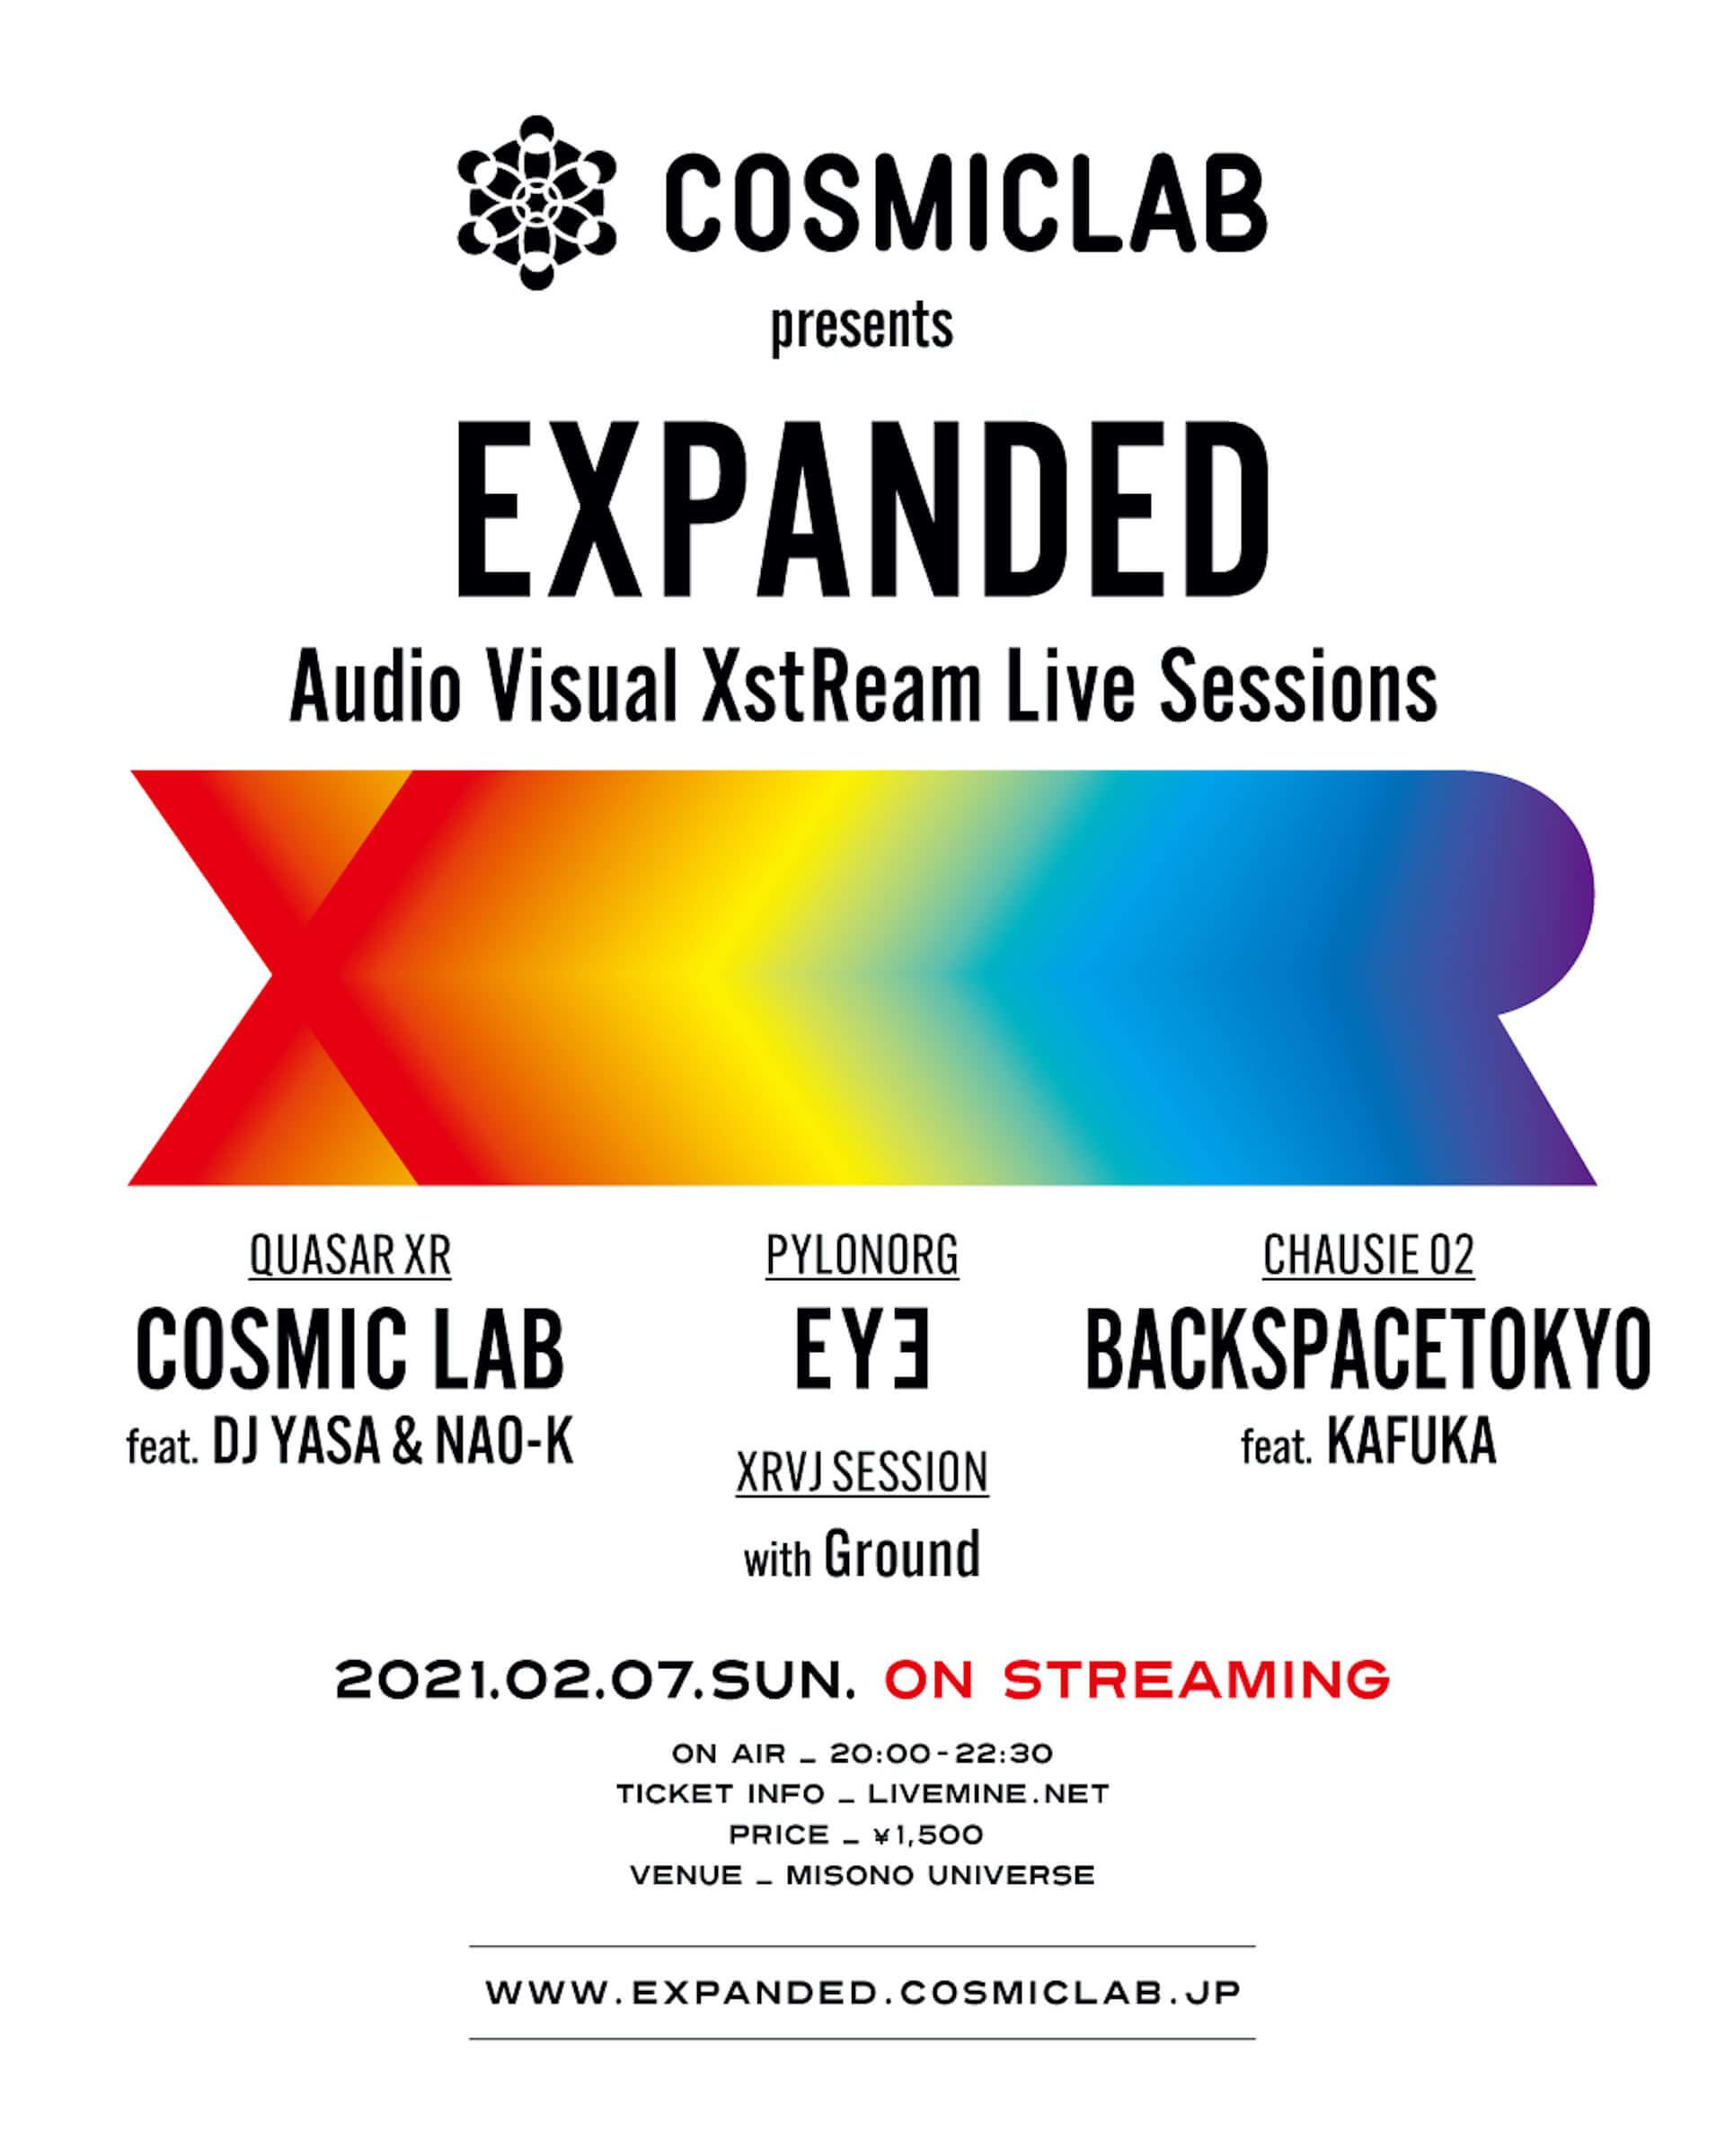 COSMIC LAB、EYヨ、BACKSPACETOKYOらが共演!音と映像によるXRショーケースが配信決定 art210118_cosmiclab_4-1920x2400